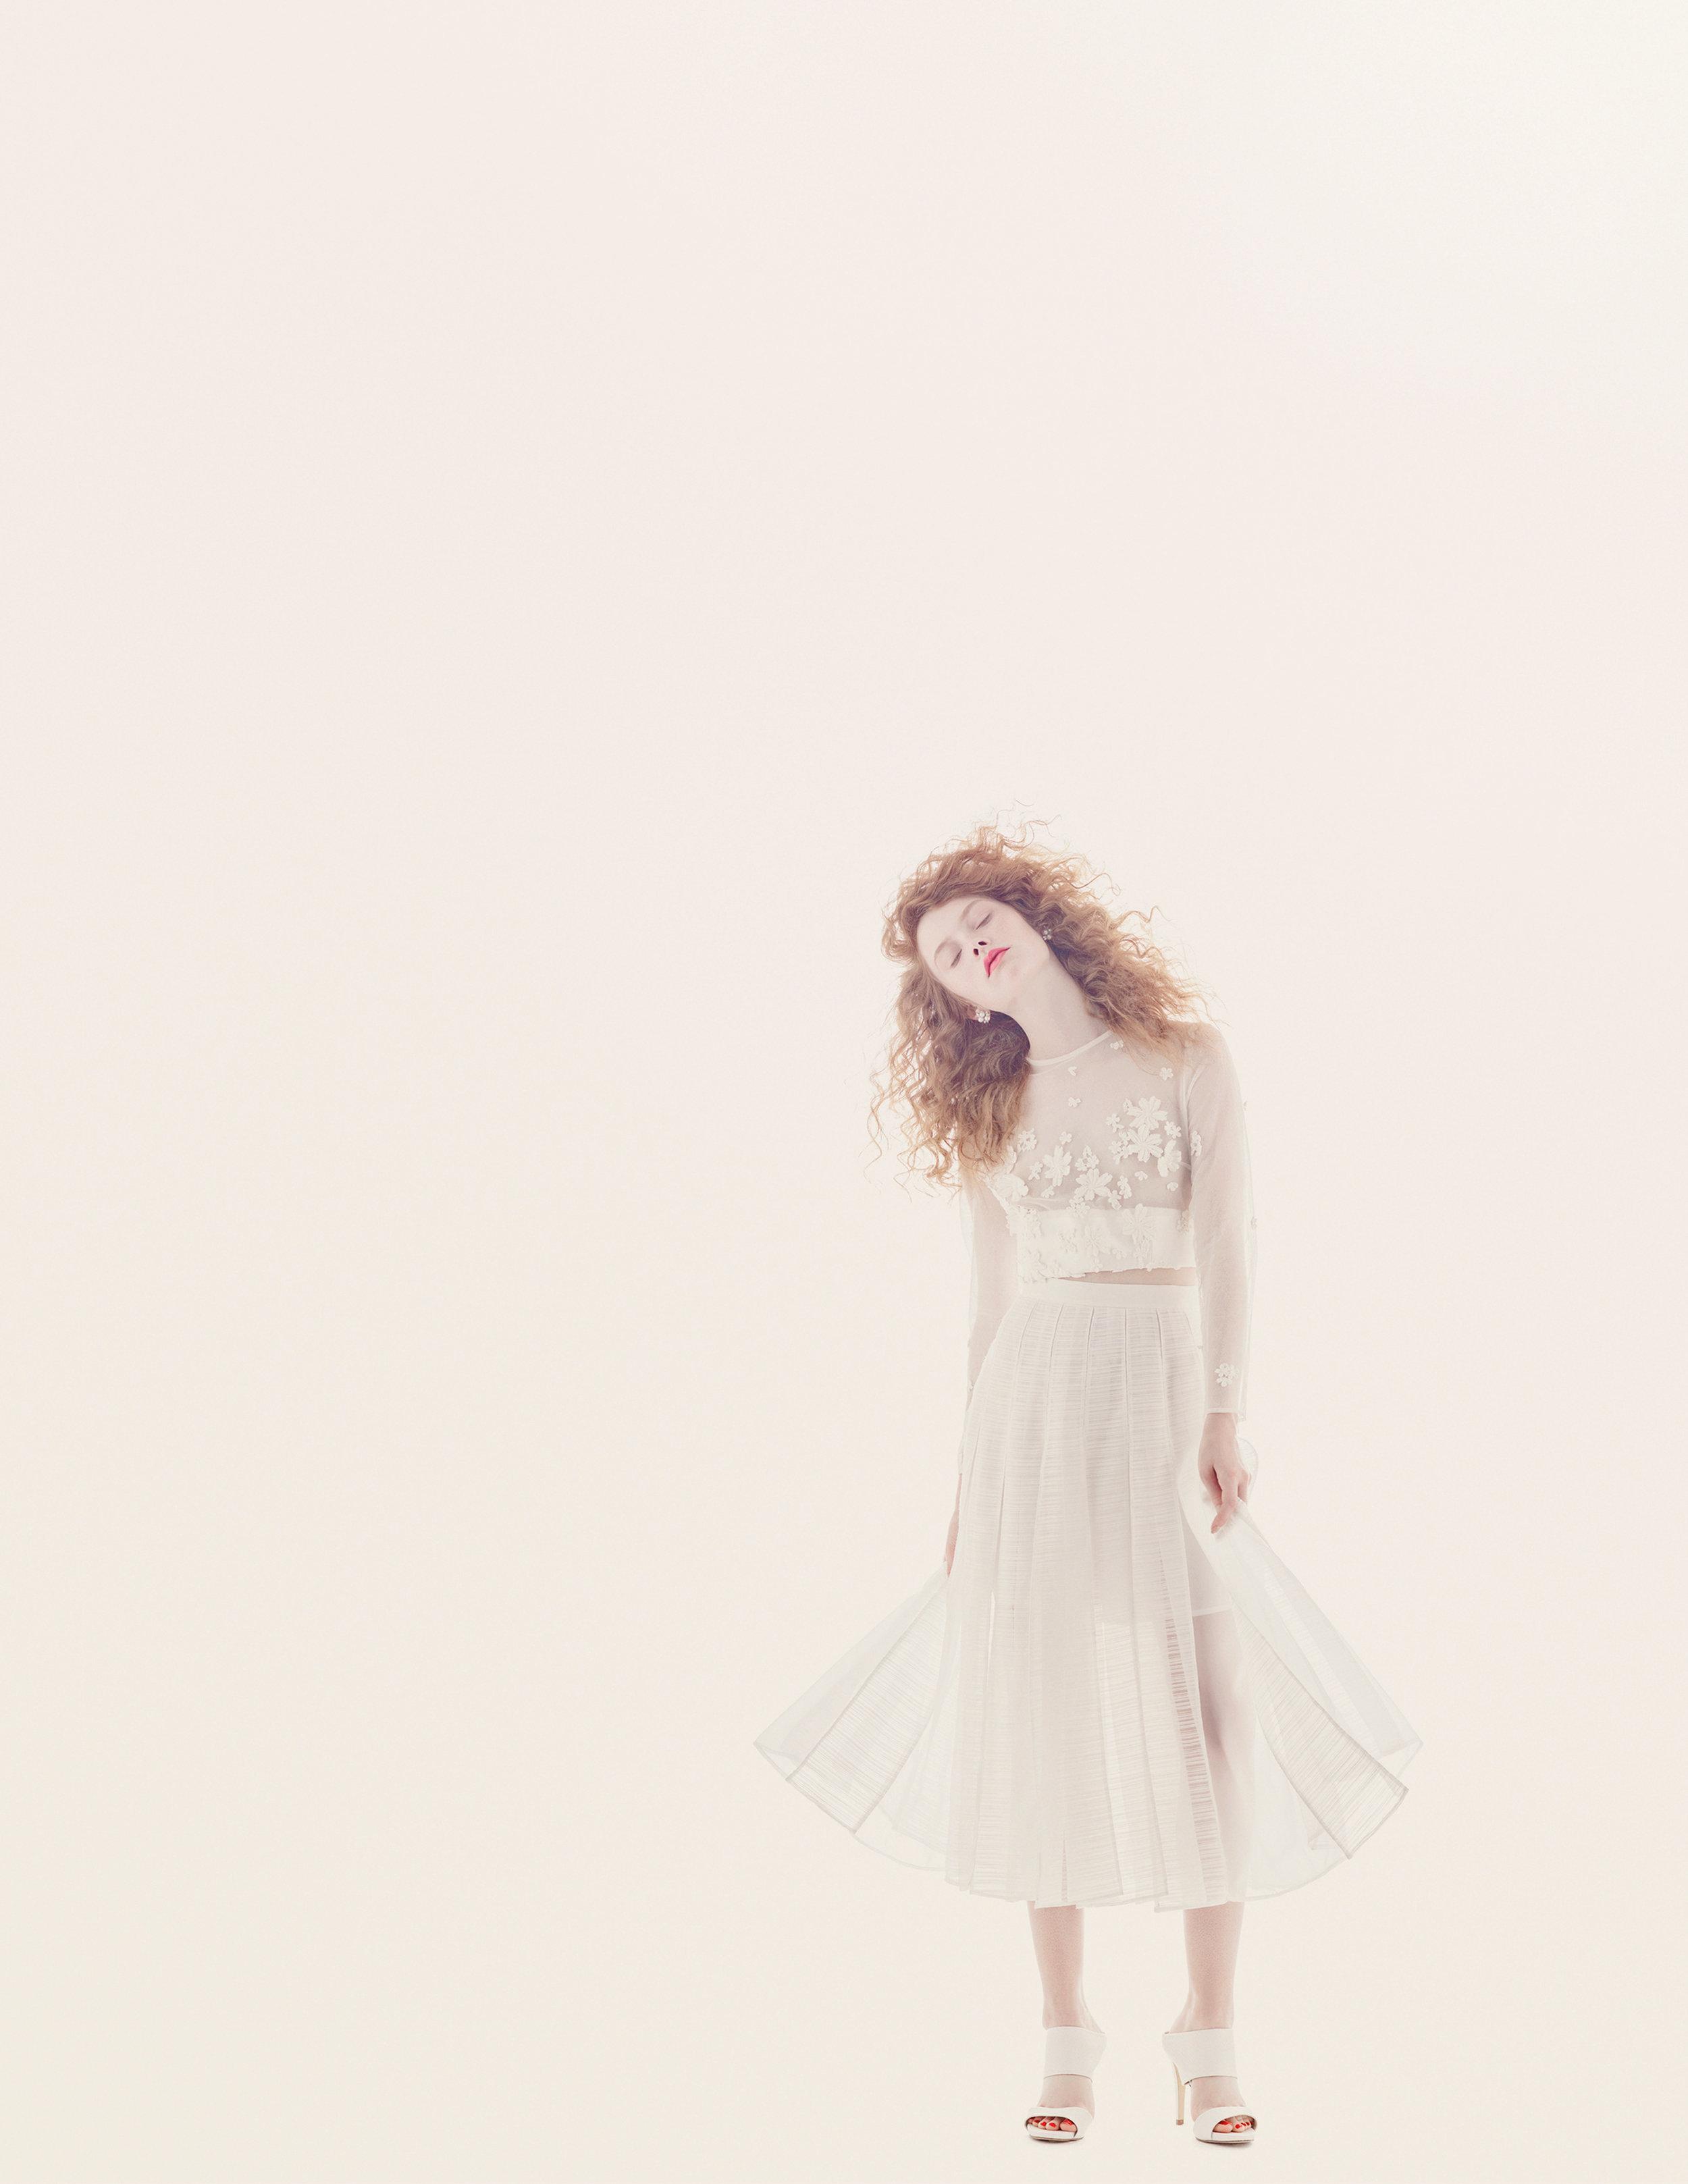 2-Emily-Bess-Marta-McAdams-Taylor-Greene-Atlas-Magazine.jpg